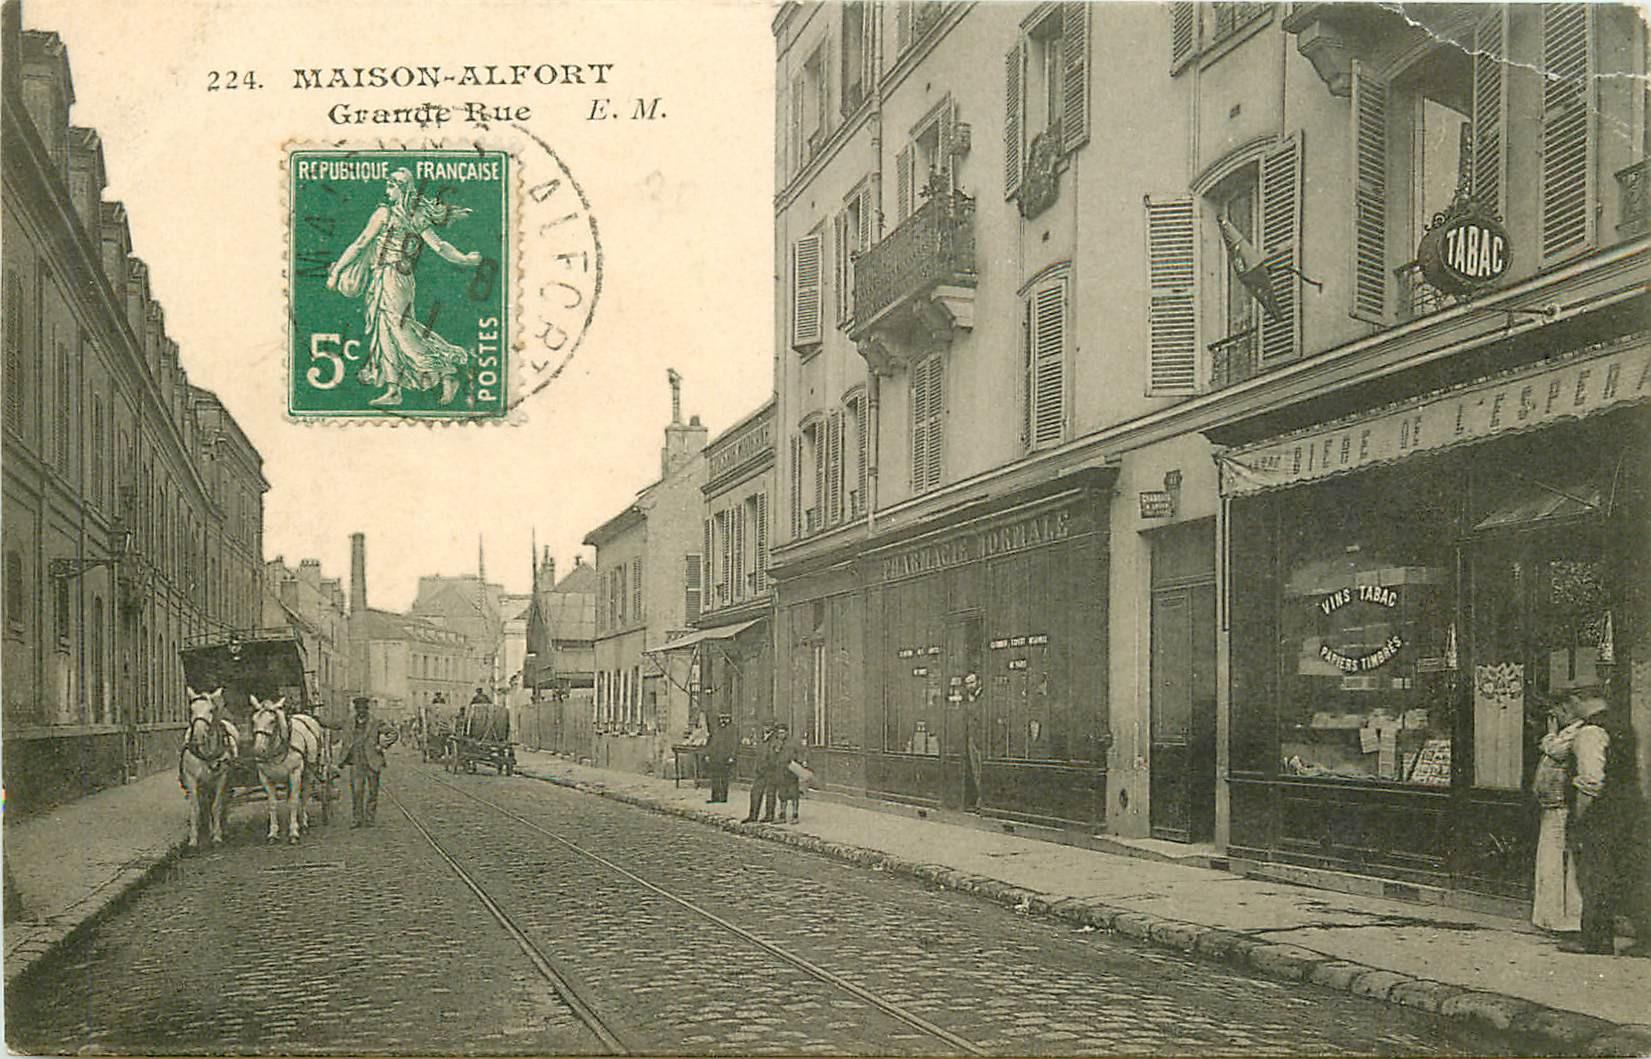 WW 94 MAISON-ALFORT. Tabac Café et Pharmacie sur Grande rue 1911